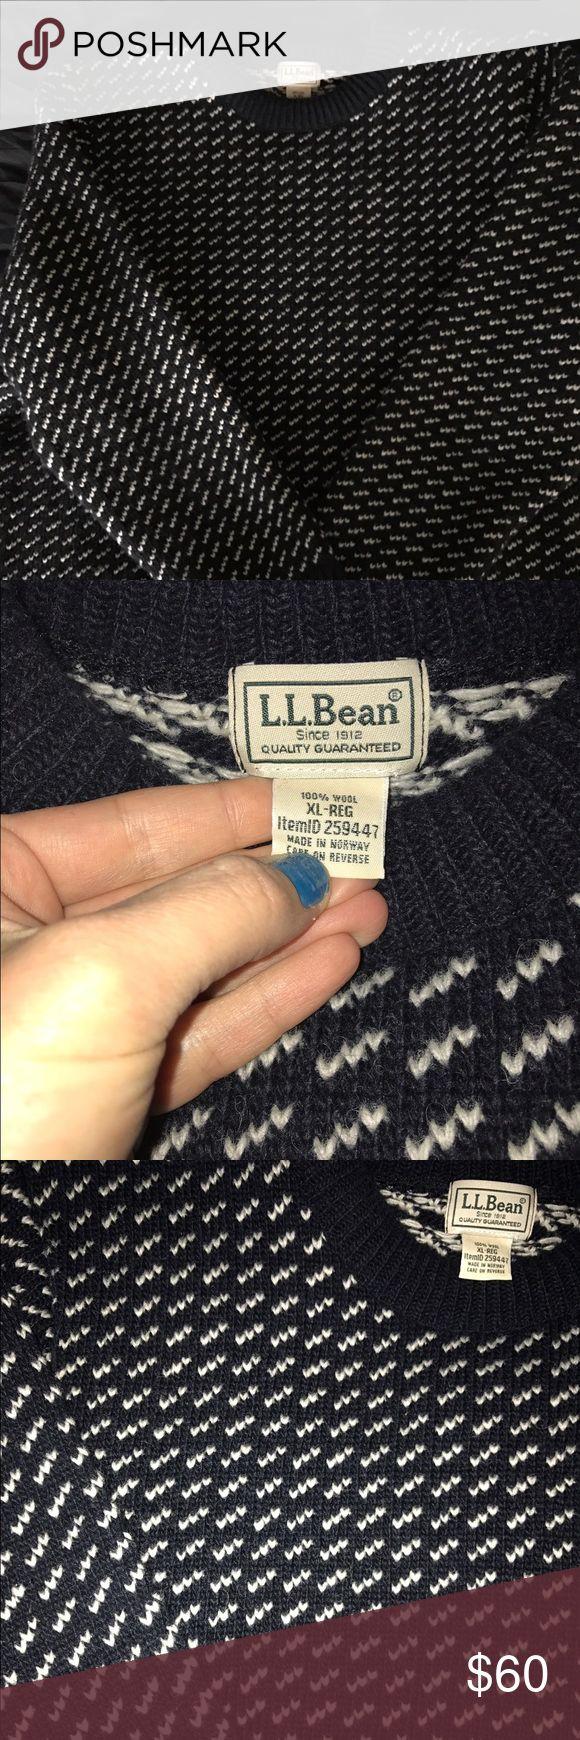 LL Bean Men's Sweater Knit, wool, Men's, crew neck Sweater by LL Bean. LL Bean Sweaters Crewneck